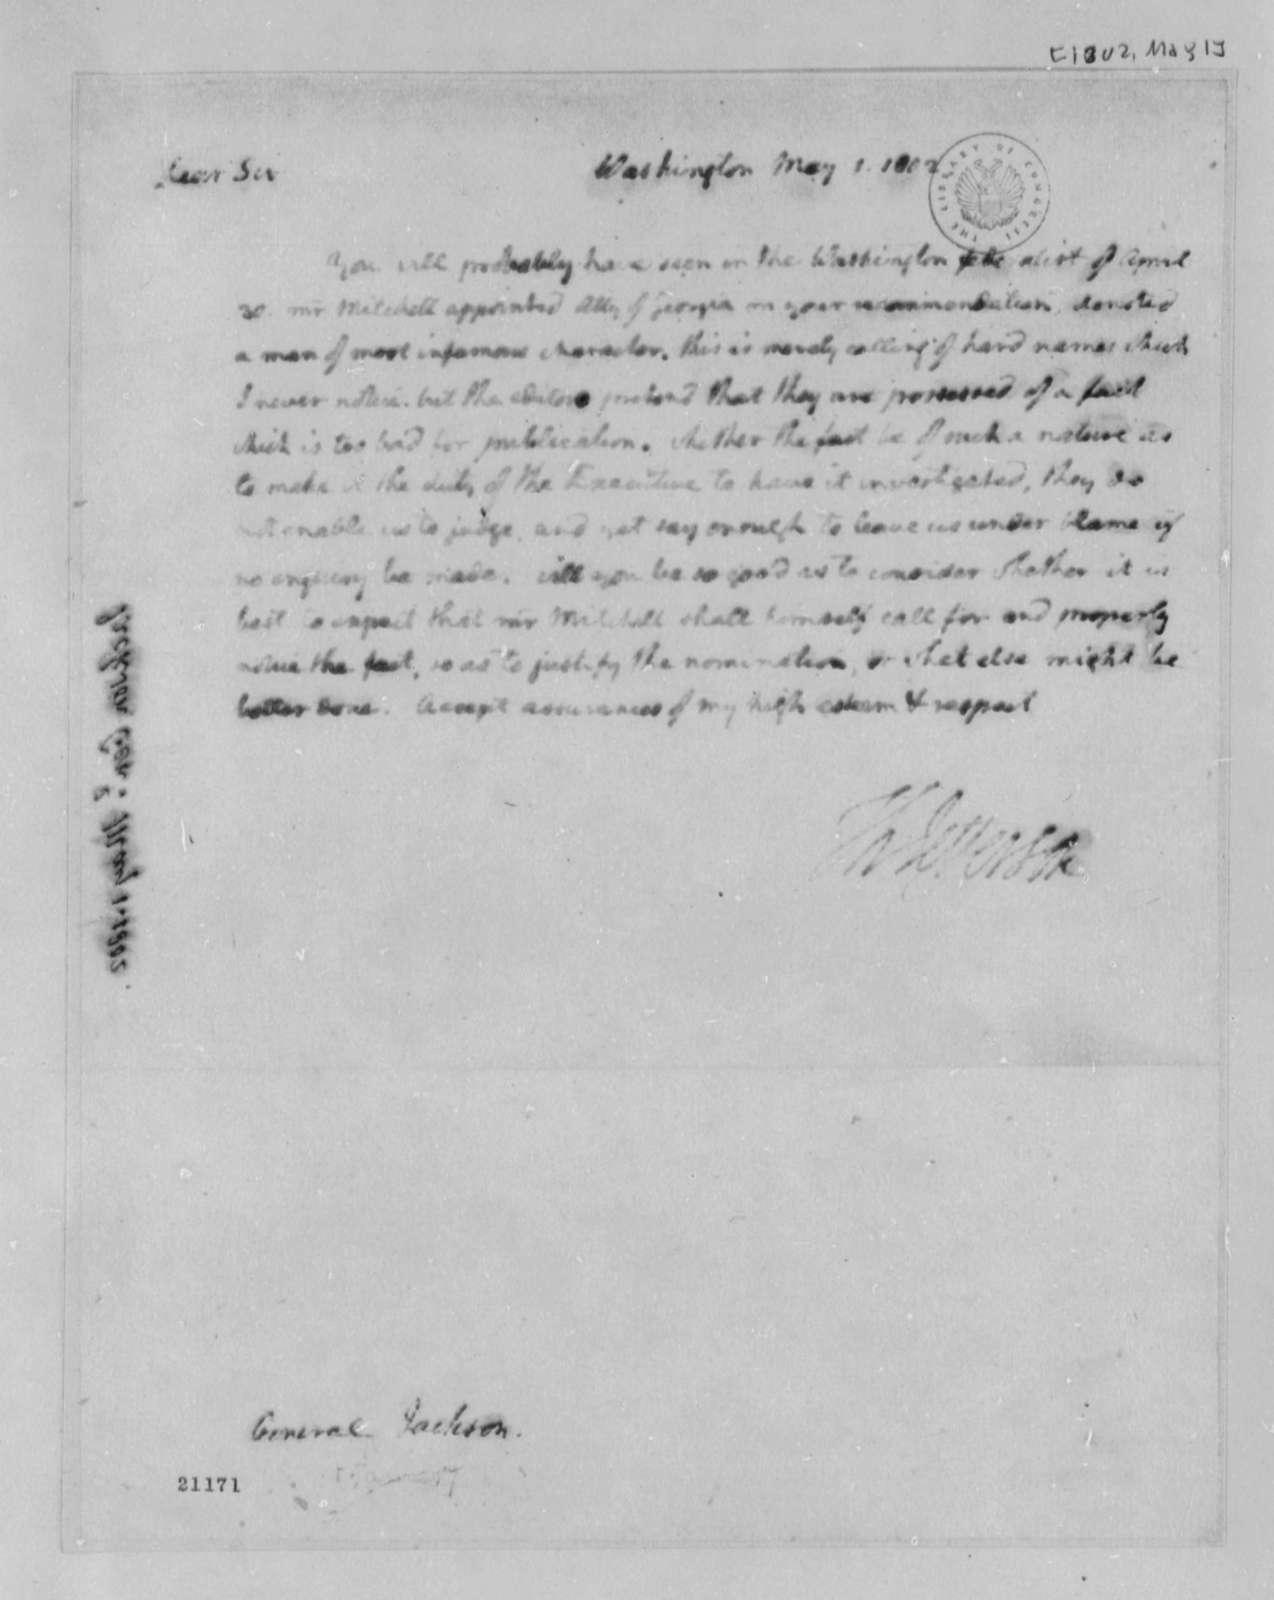 Thomas Jefferson to James Jackson, May 1, 1802